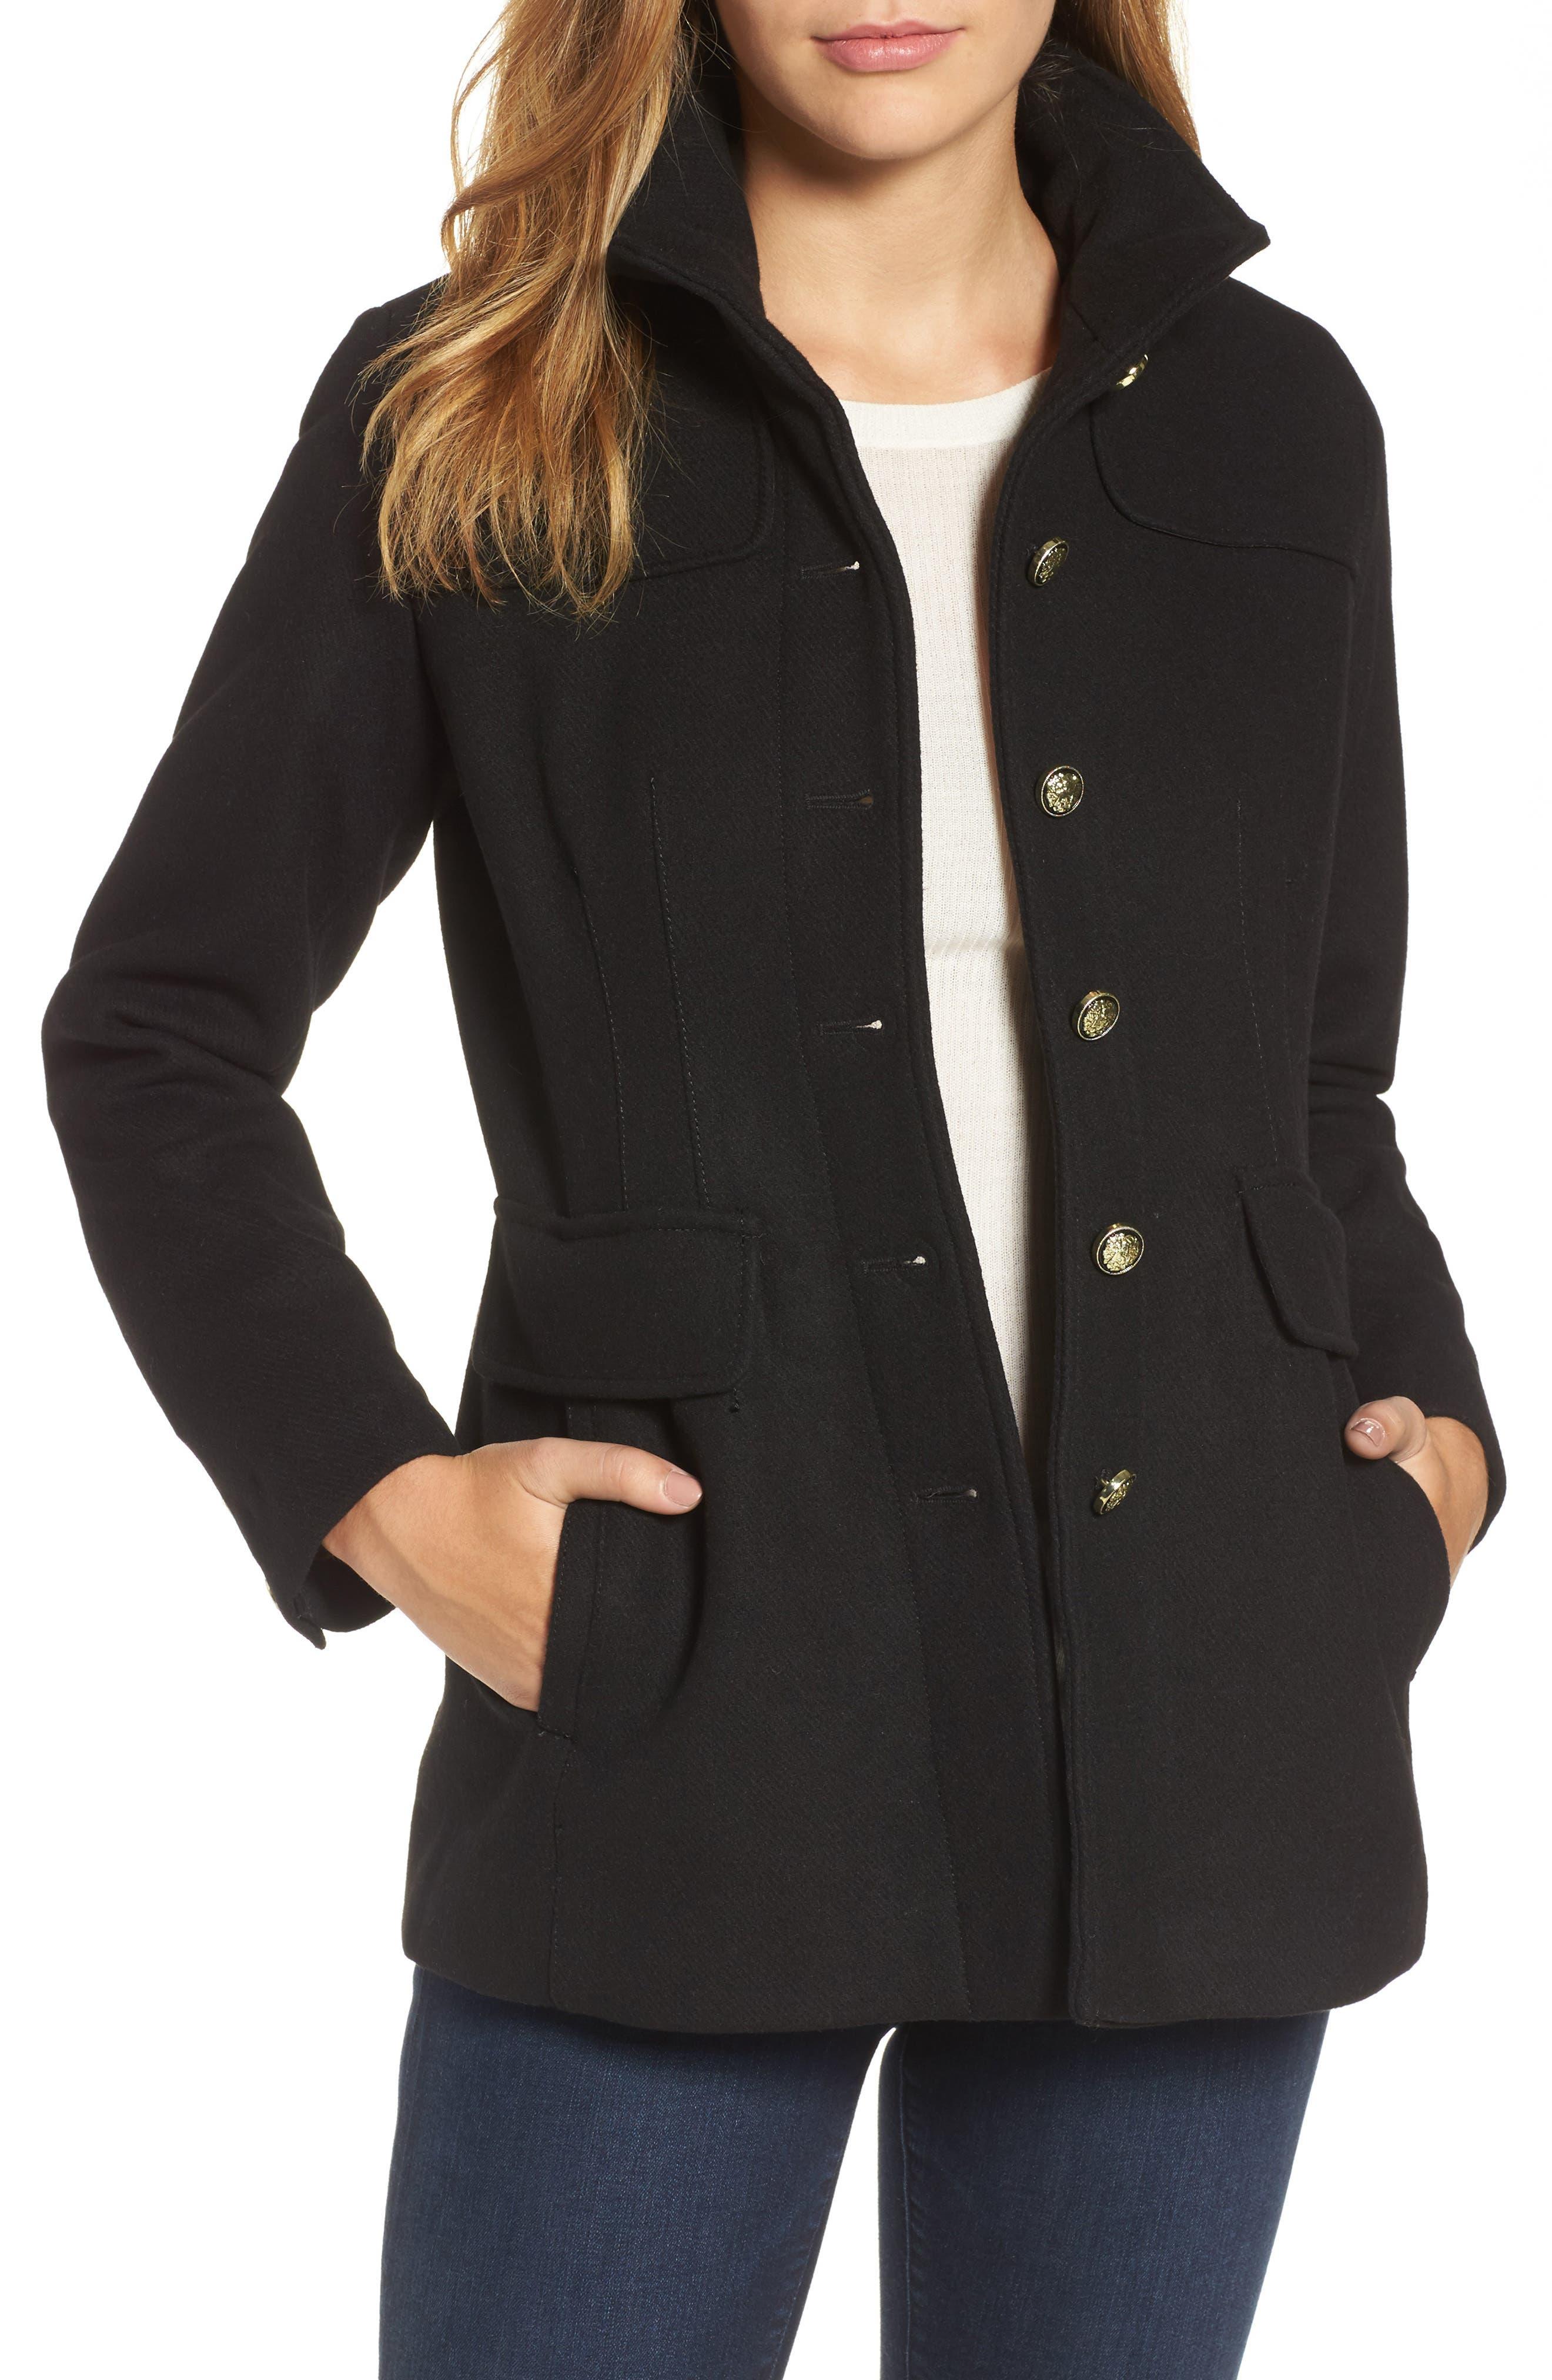 Alternate Image 1 Selected - Vince Camuto Wool Blend Coat